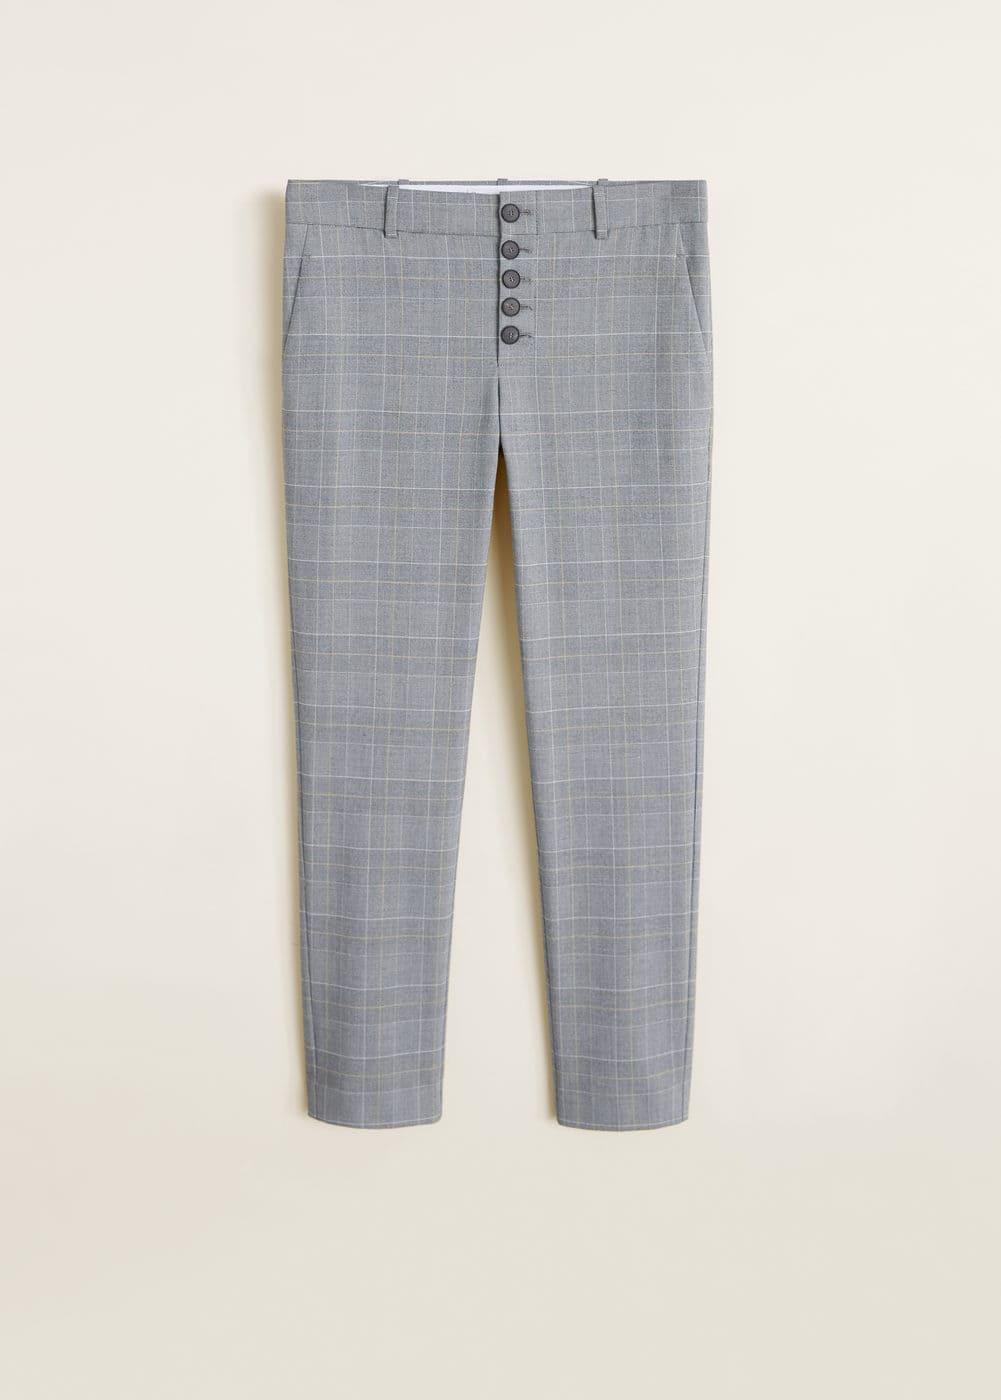 Mango - Buttons cotton trousers - 5